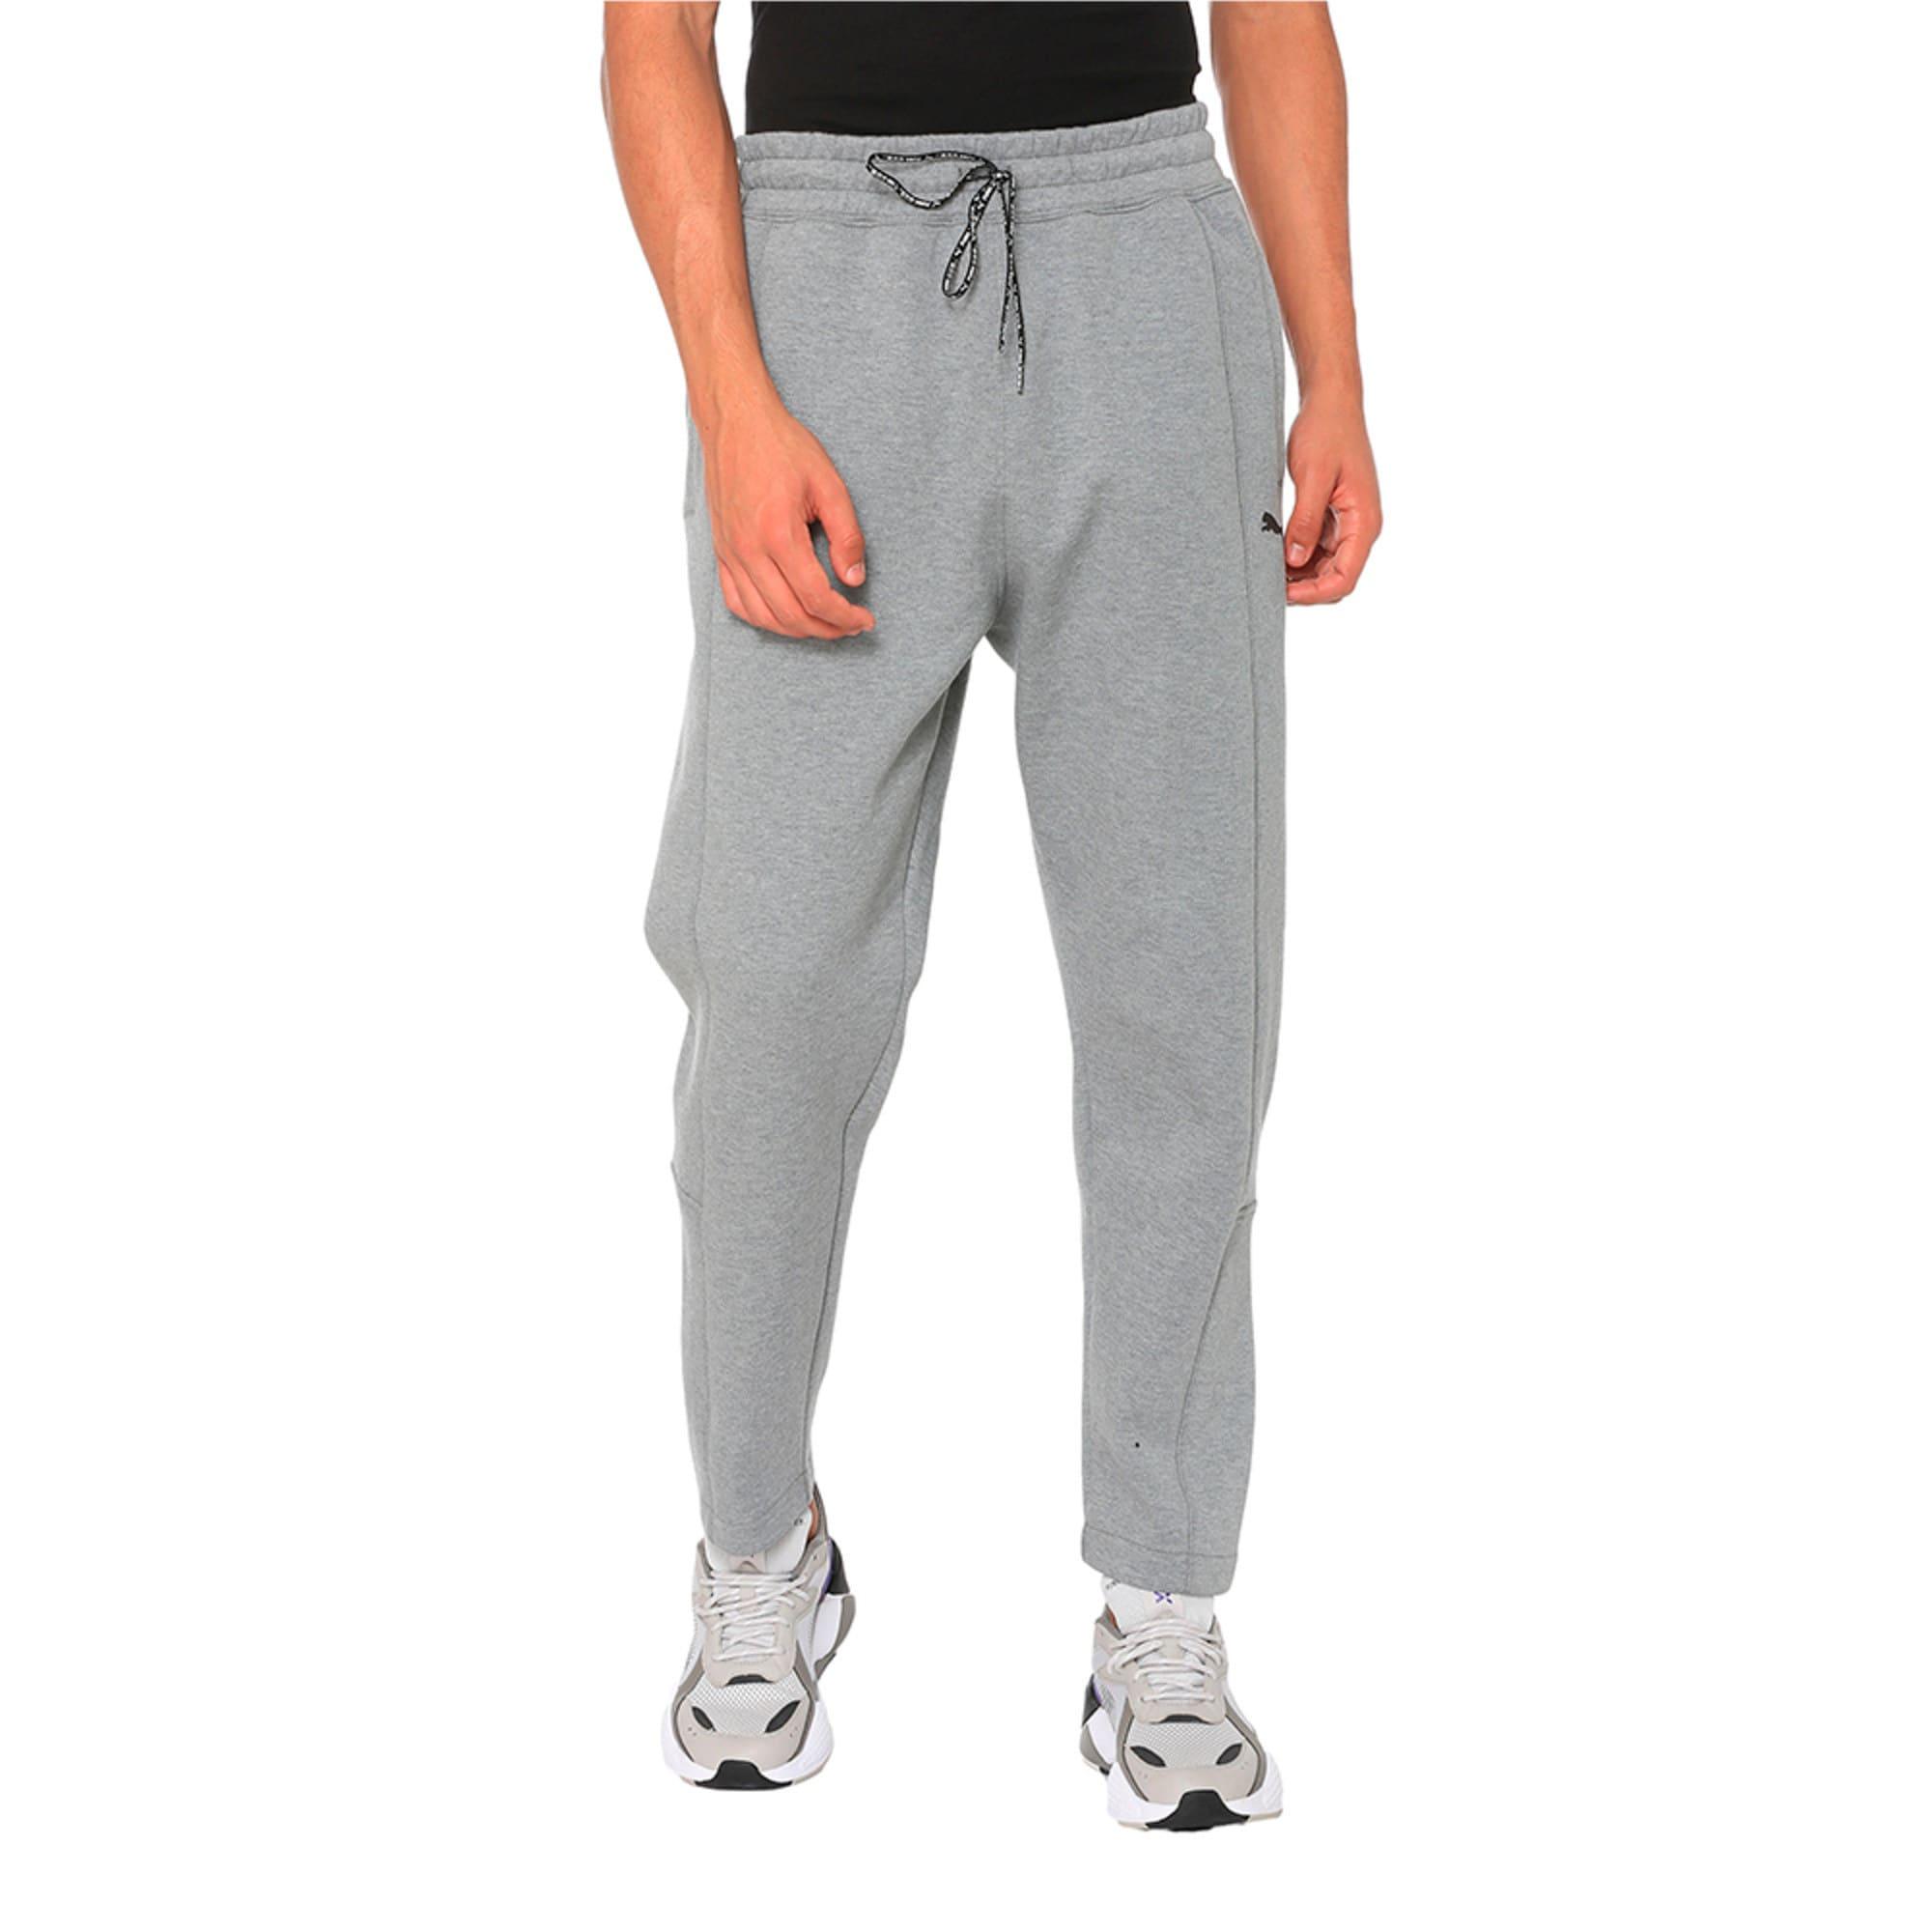 Thumbnail 2 of Epoch Knitted Men's Pants, Medium Gray Heather, medium-IND